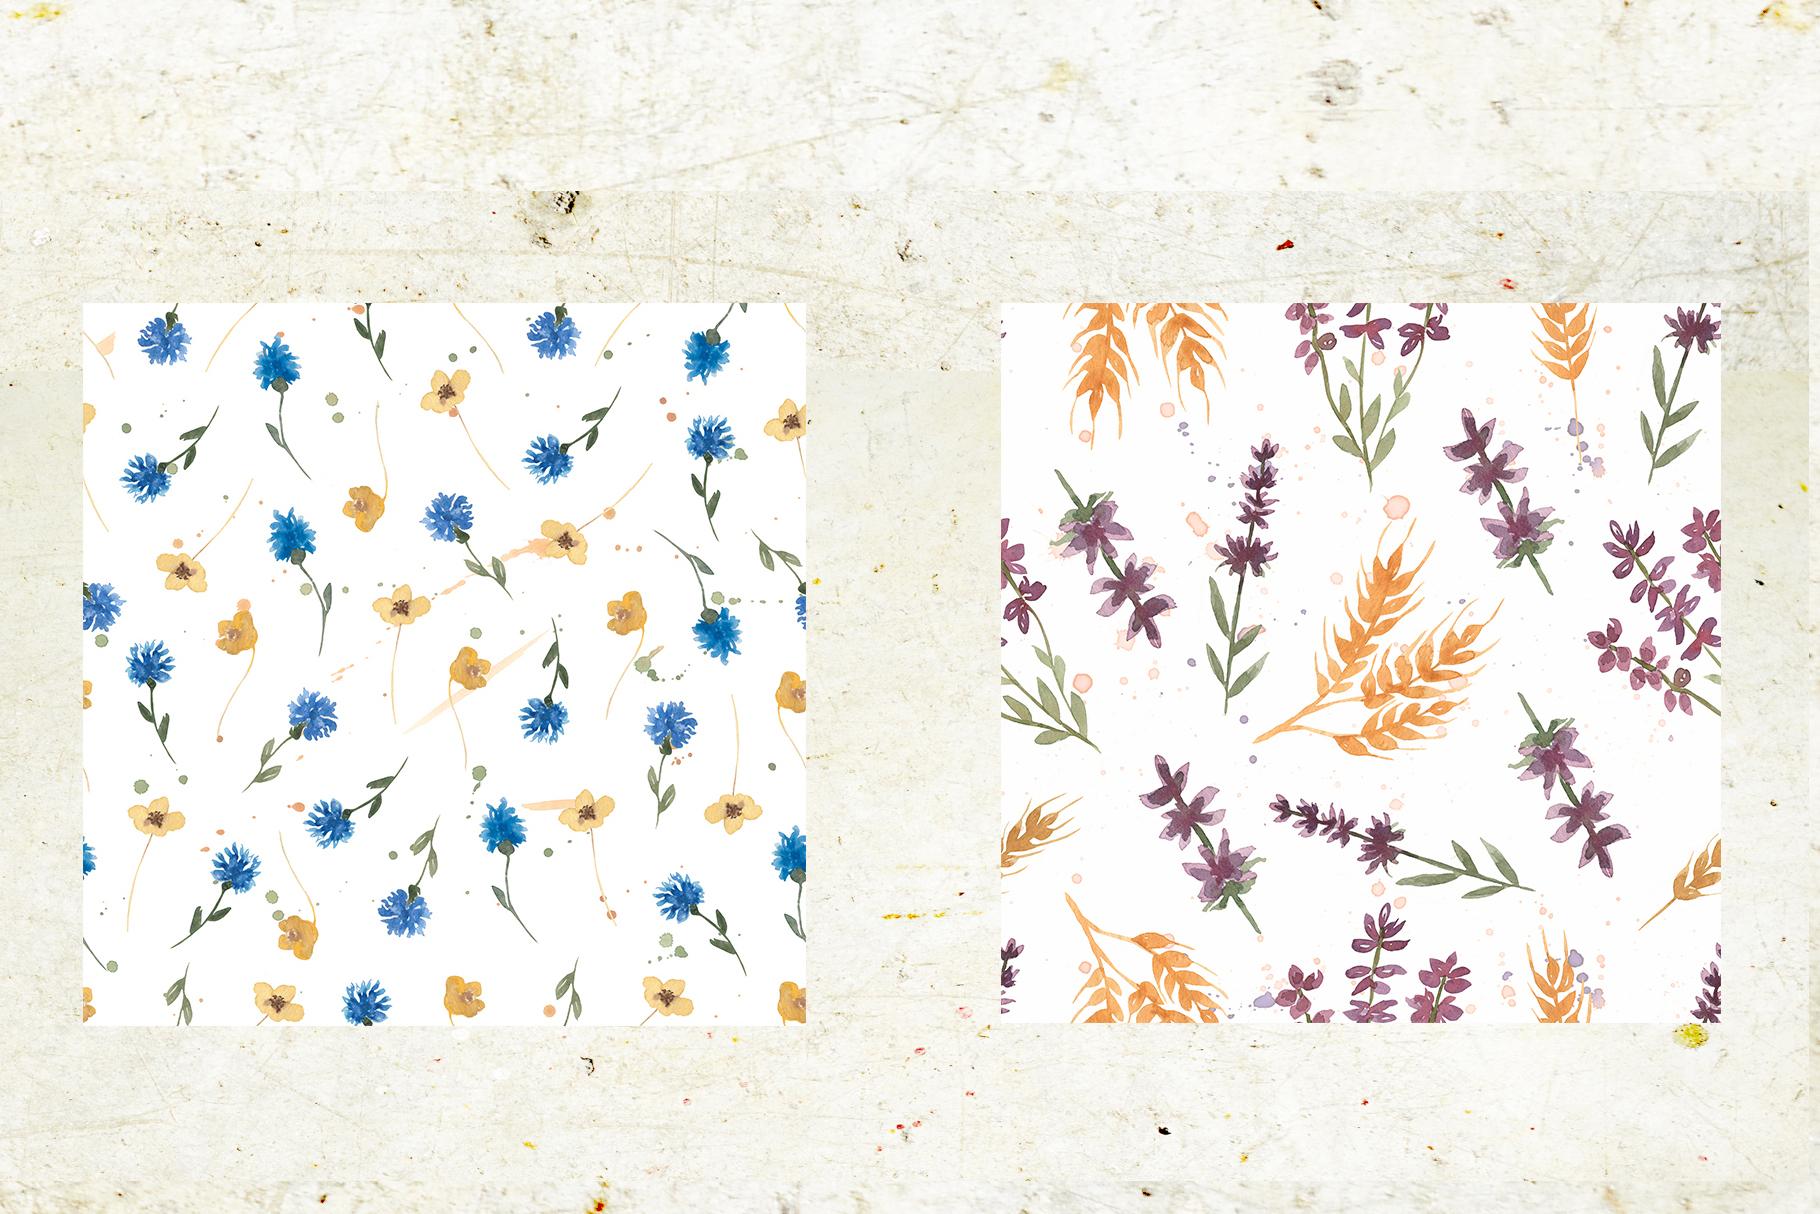 Wildflowers field example image 10